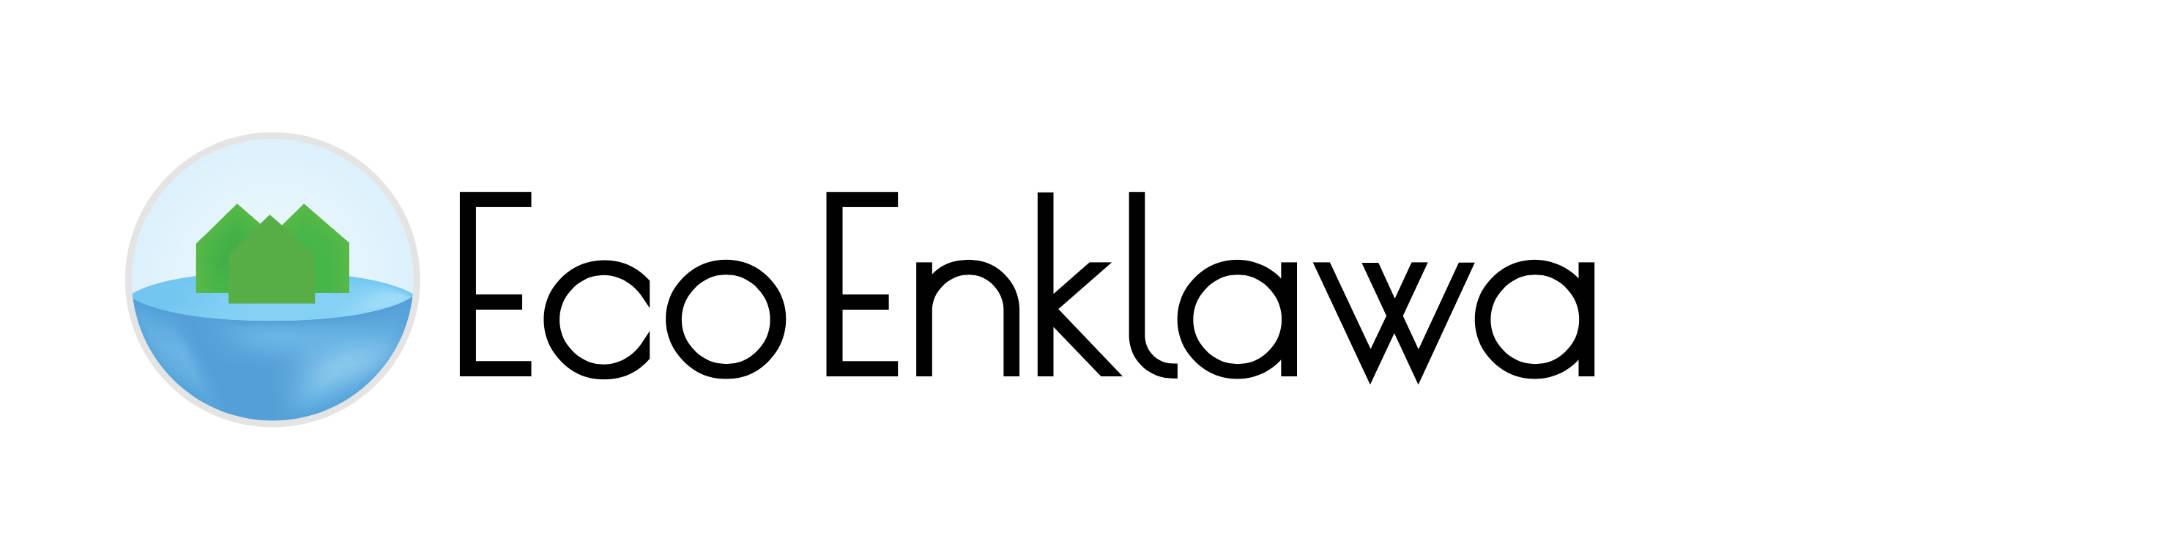 Developed by Kacper Nowakowski - GRADIENT